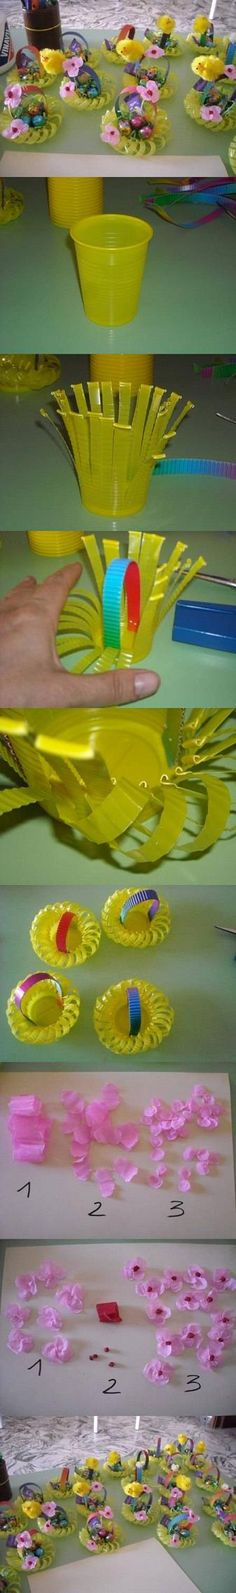 DIY Plastic Cup Flower Basket DIY Projects | UsefulDIY.com